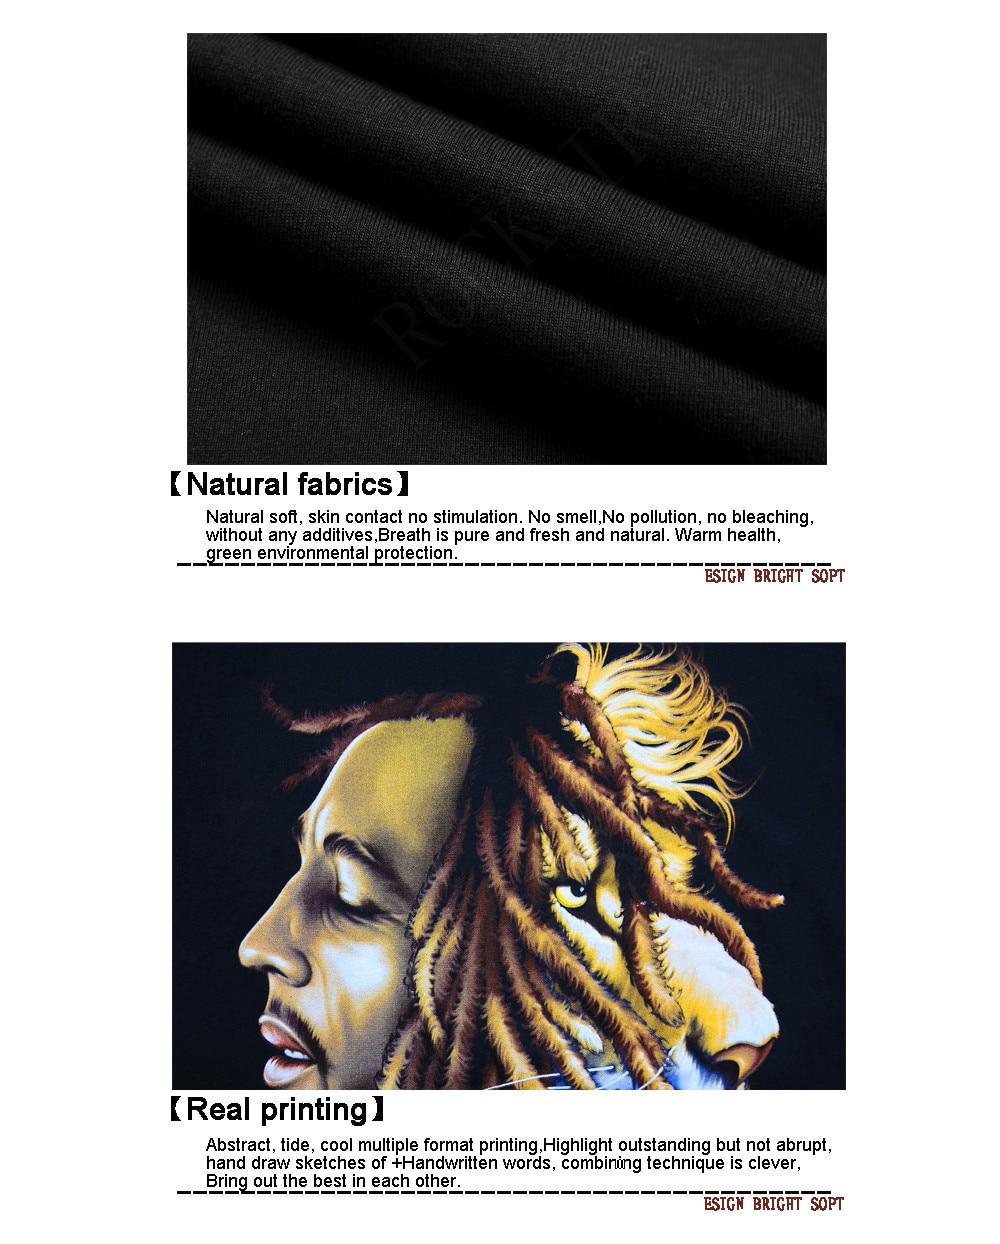 Hochwertige D Bedruckte T Shirt Fur Manner Bob Marley Zitate Musik Reggae Rastafari Kurzarm T Shirt Fashion Casual Tops Camiseta In Hochwertige D